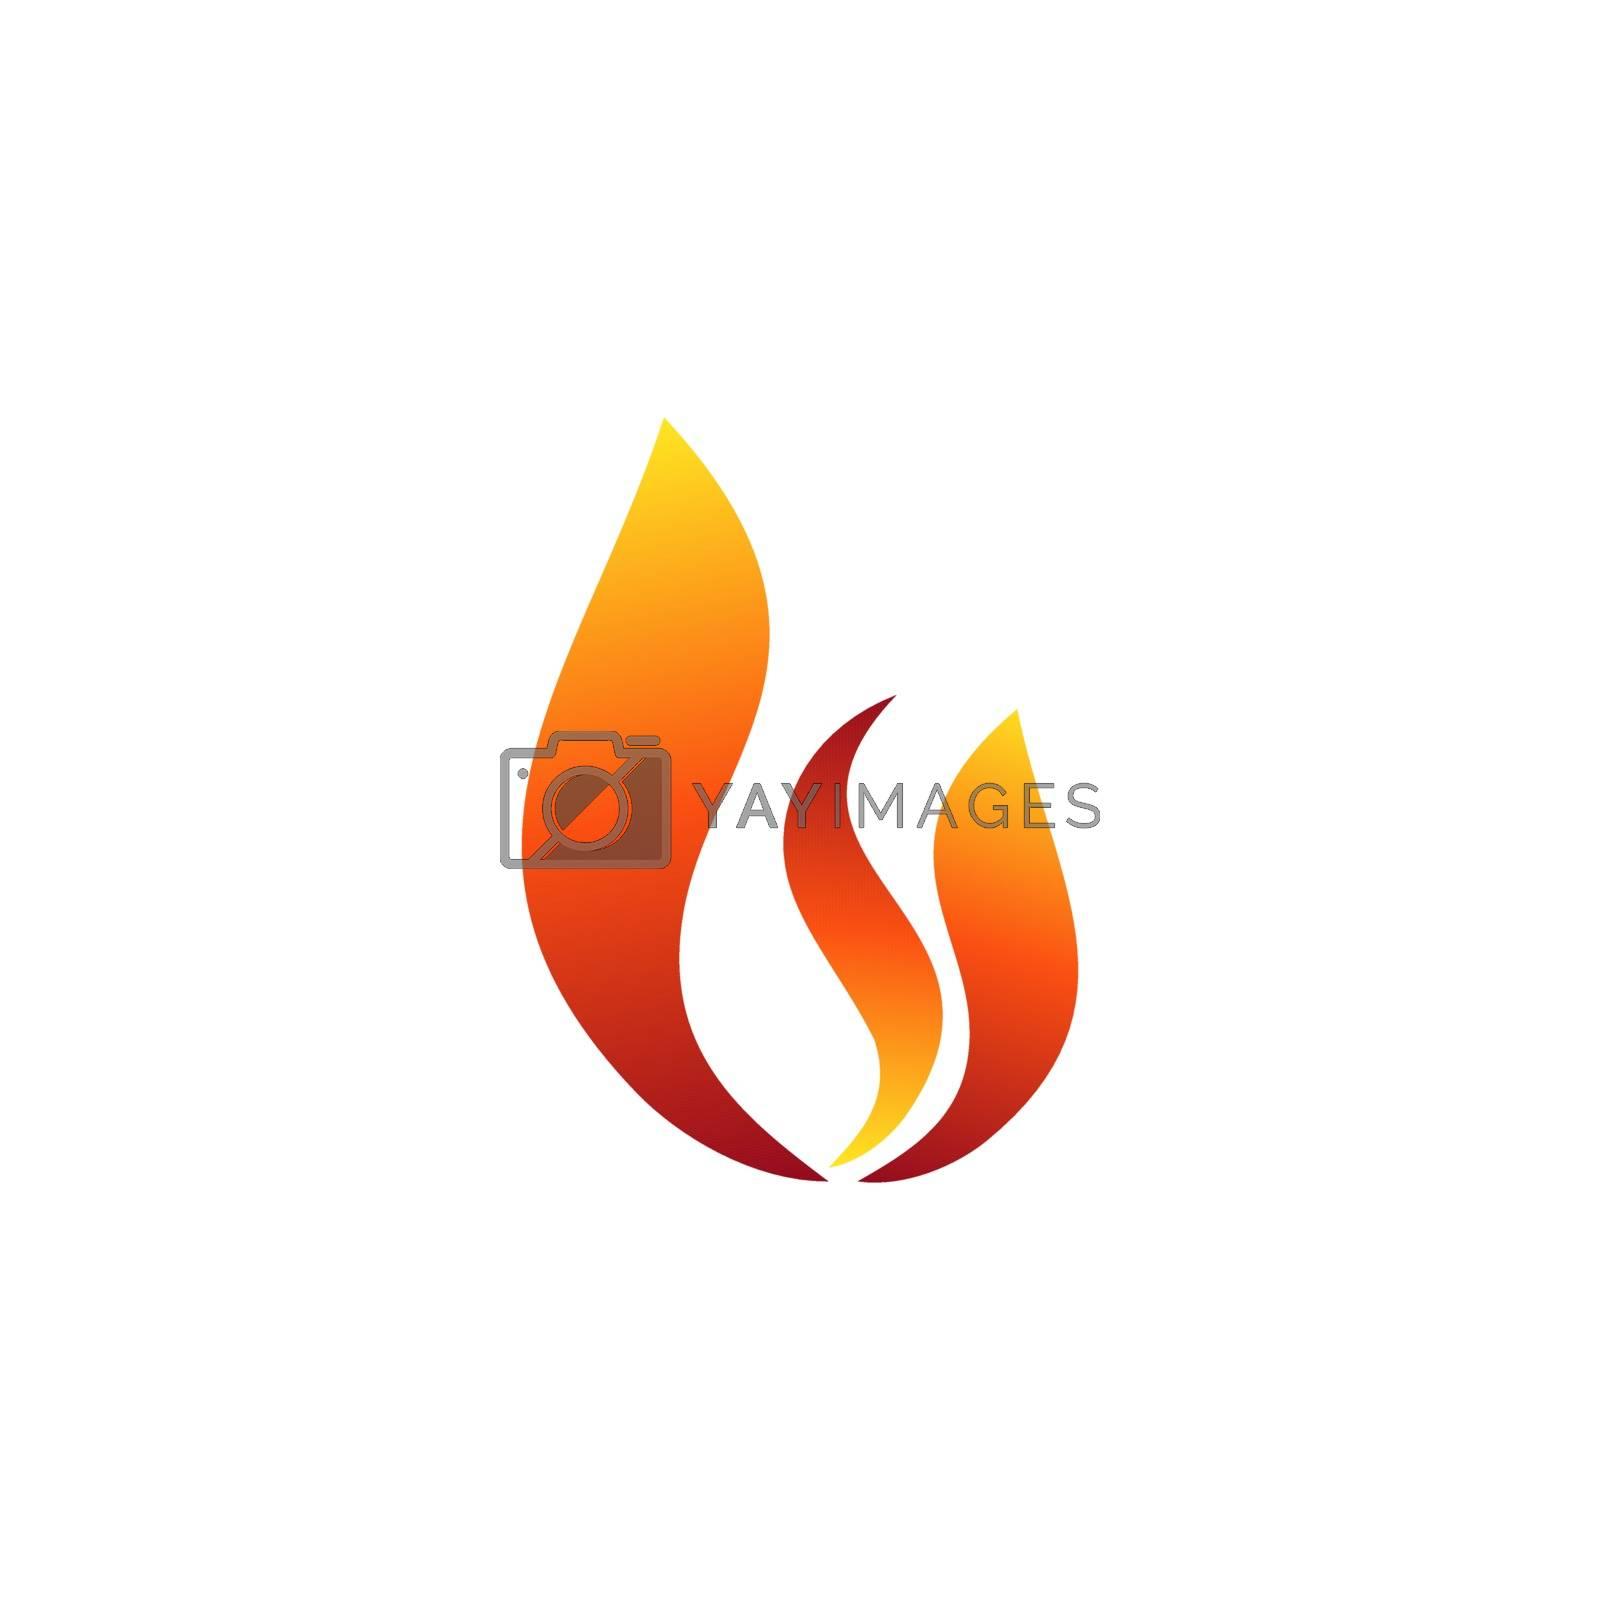 hot fire flame logo symbol icon design vector illustration